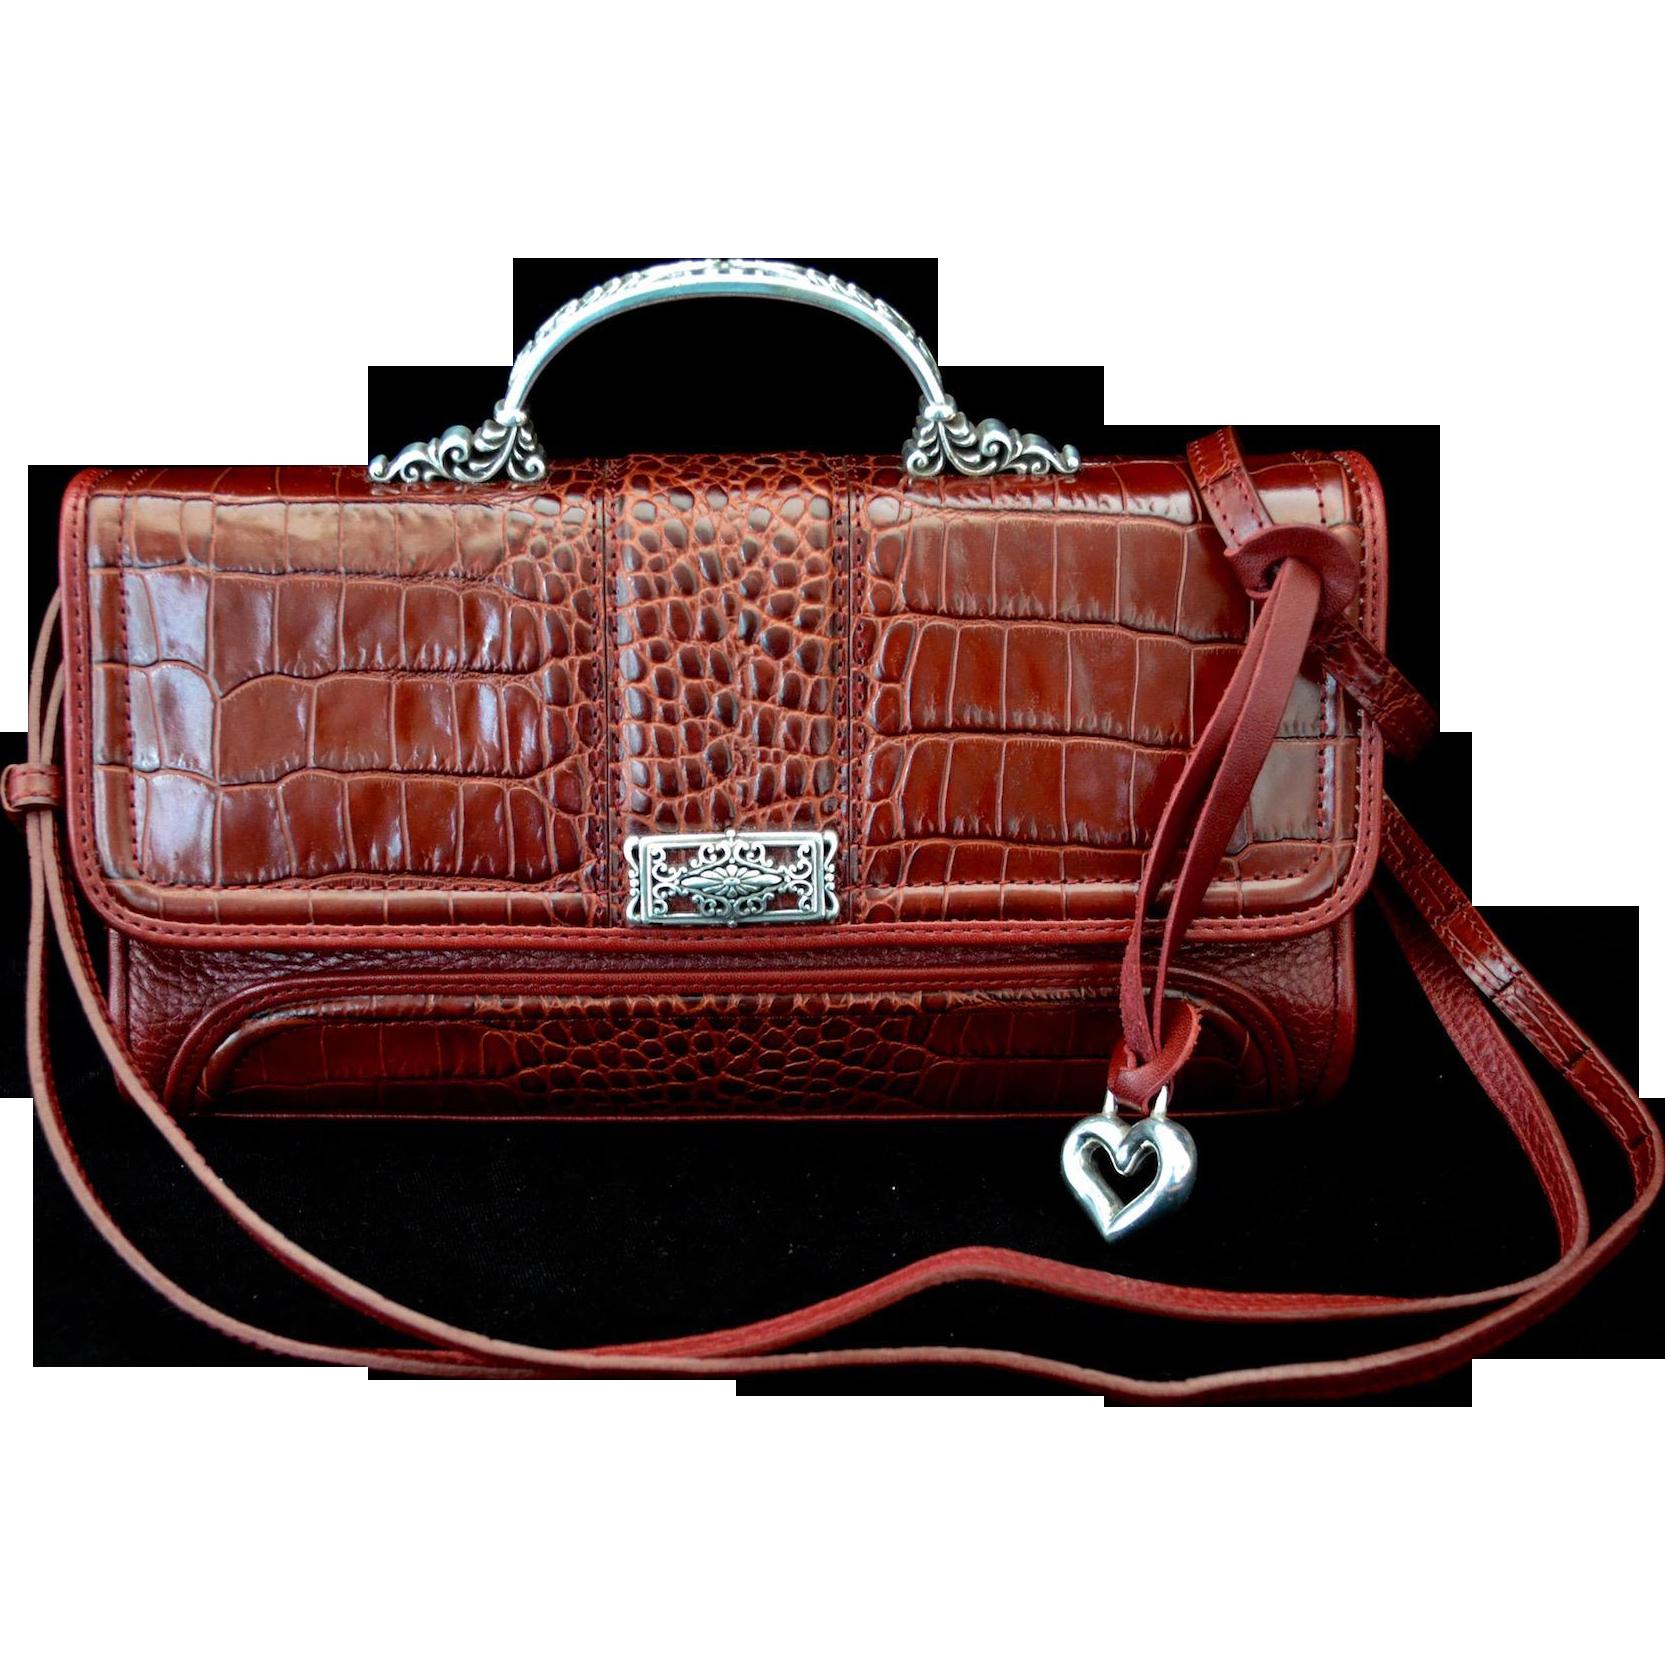 Vintage Designer Red Faux Croc Handbag Cross-Body Style